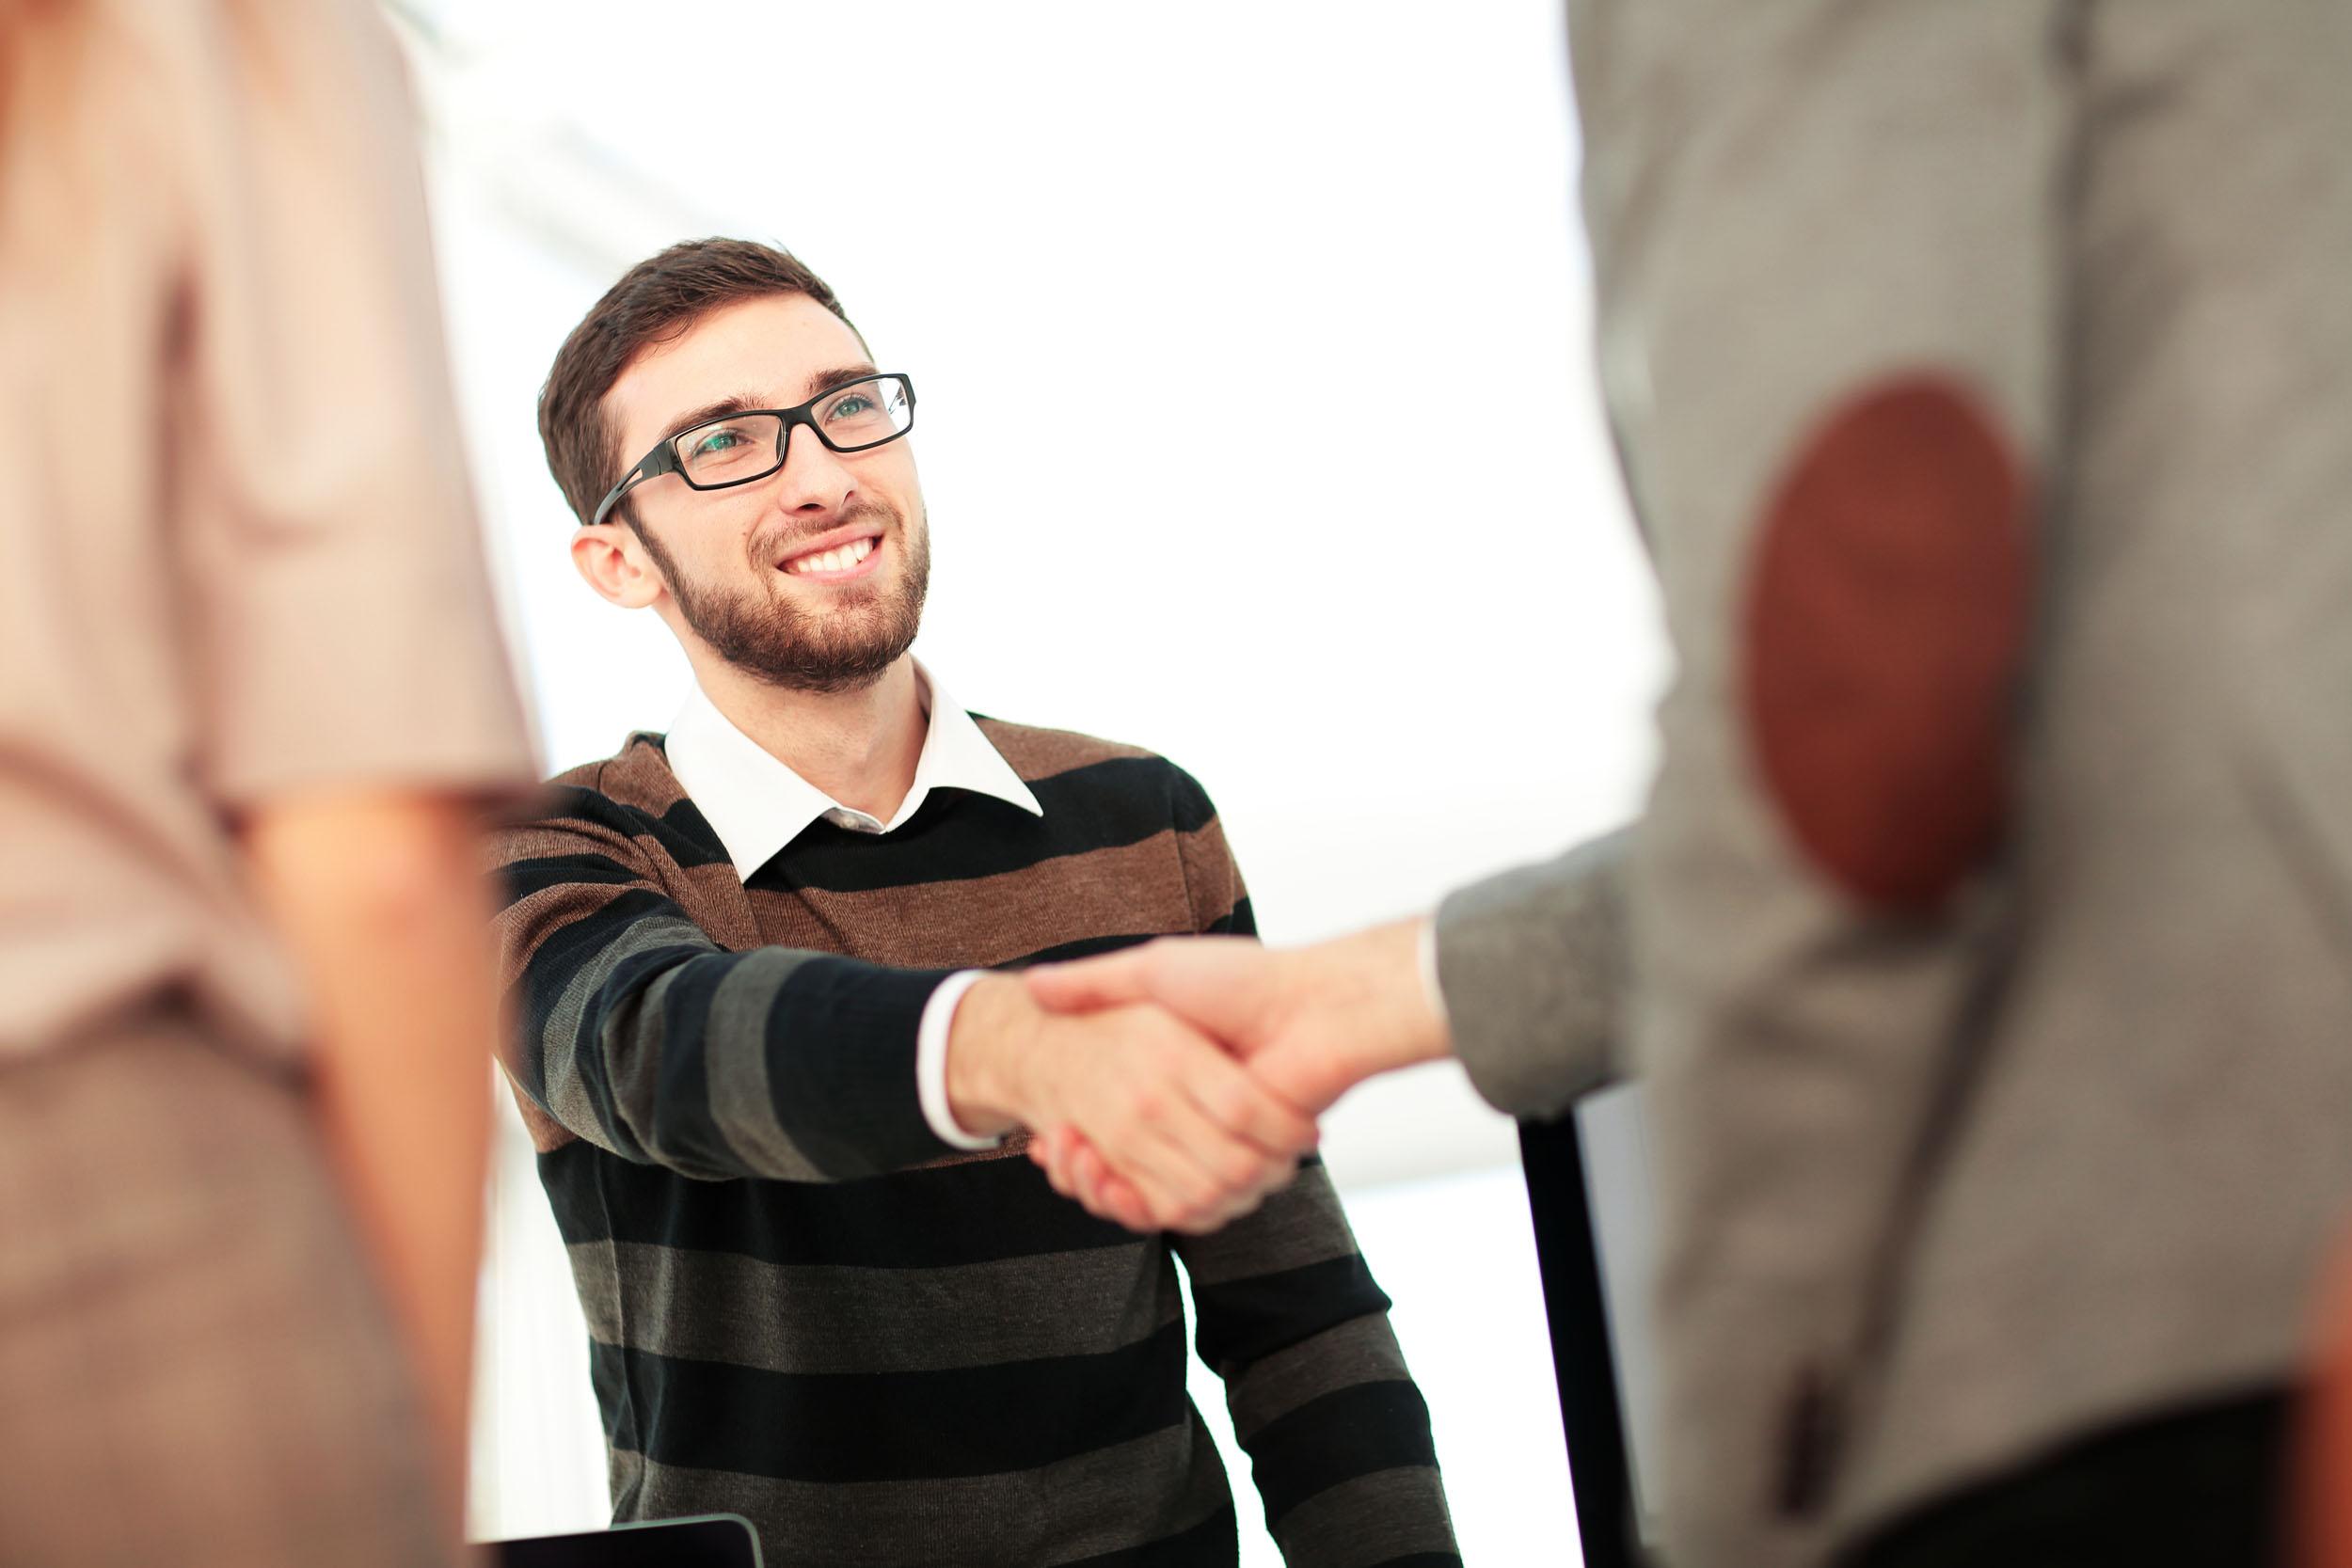 man shaking hands.jpg